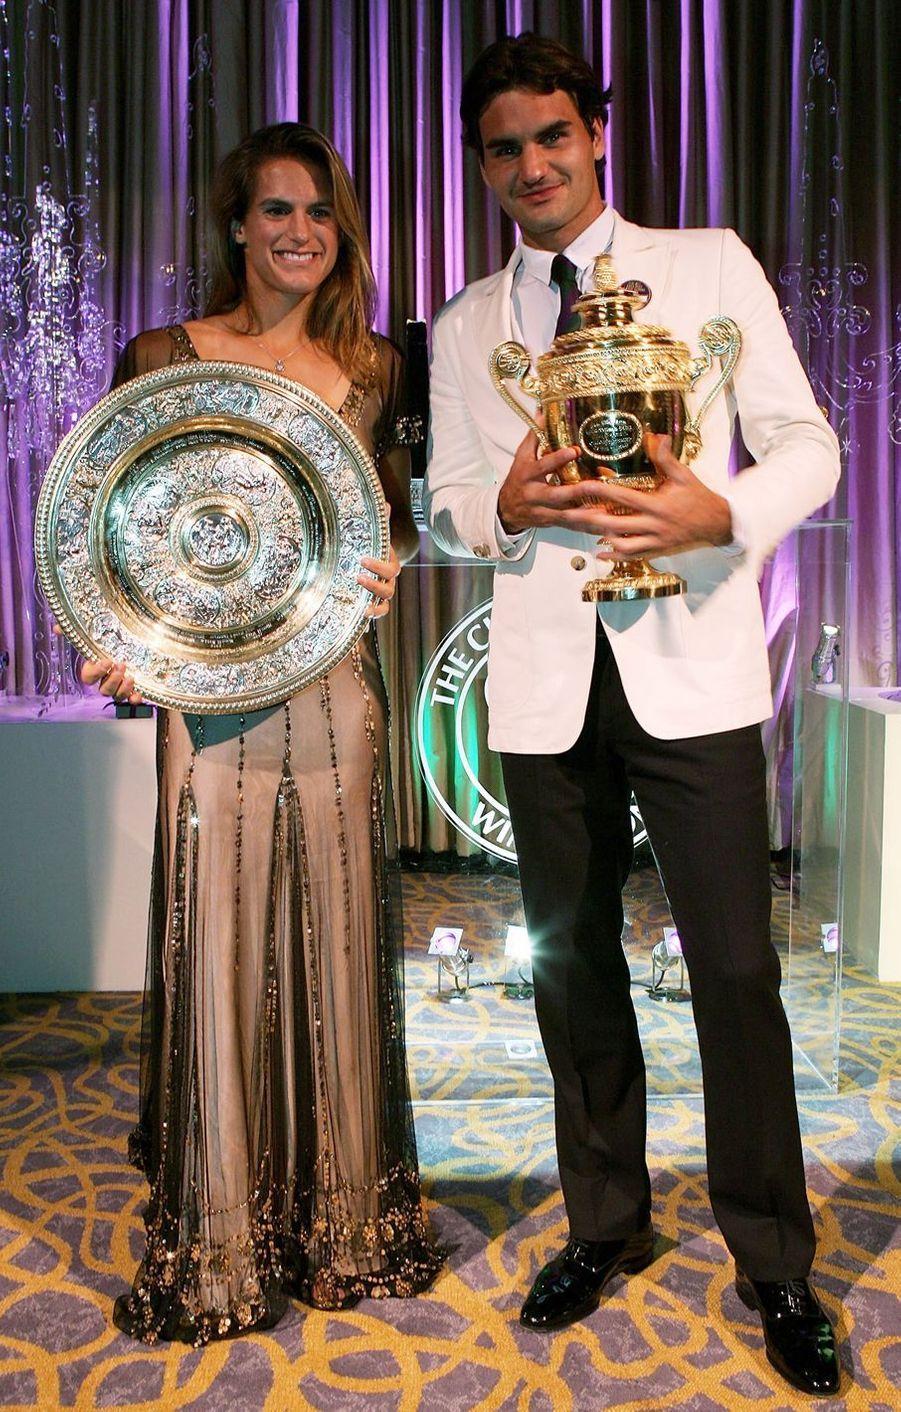 Roger Federer et Amélie Mauresmo à Londres, le 9 juillet 2006